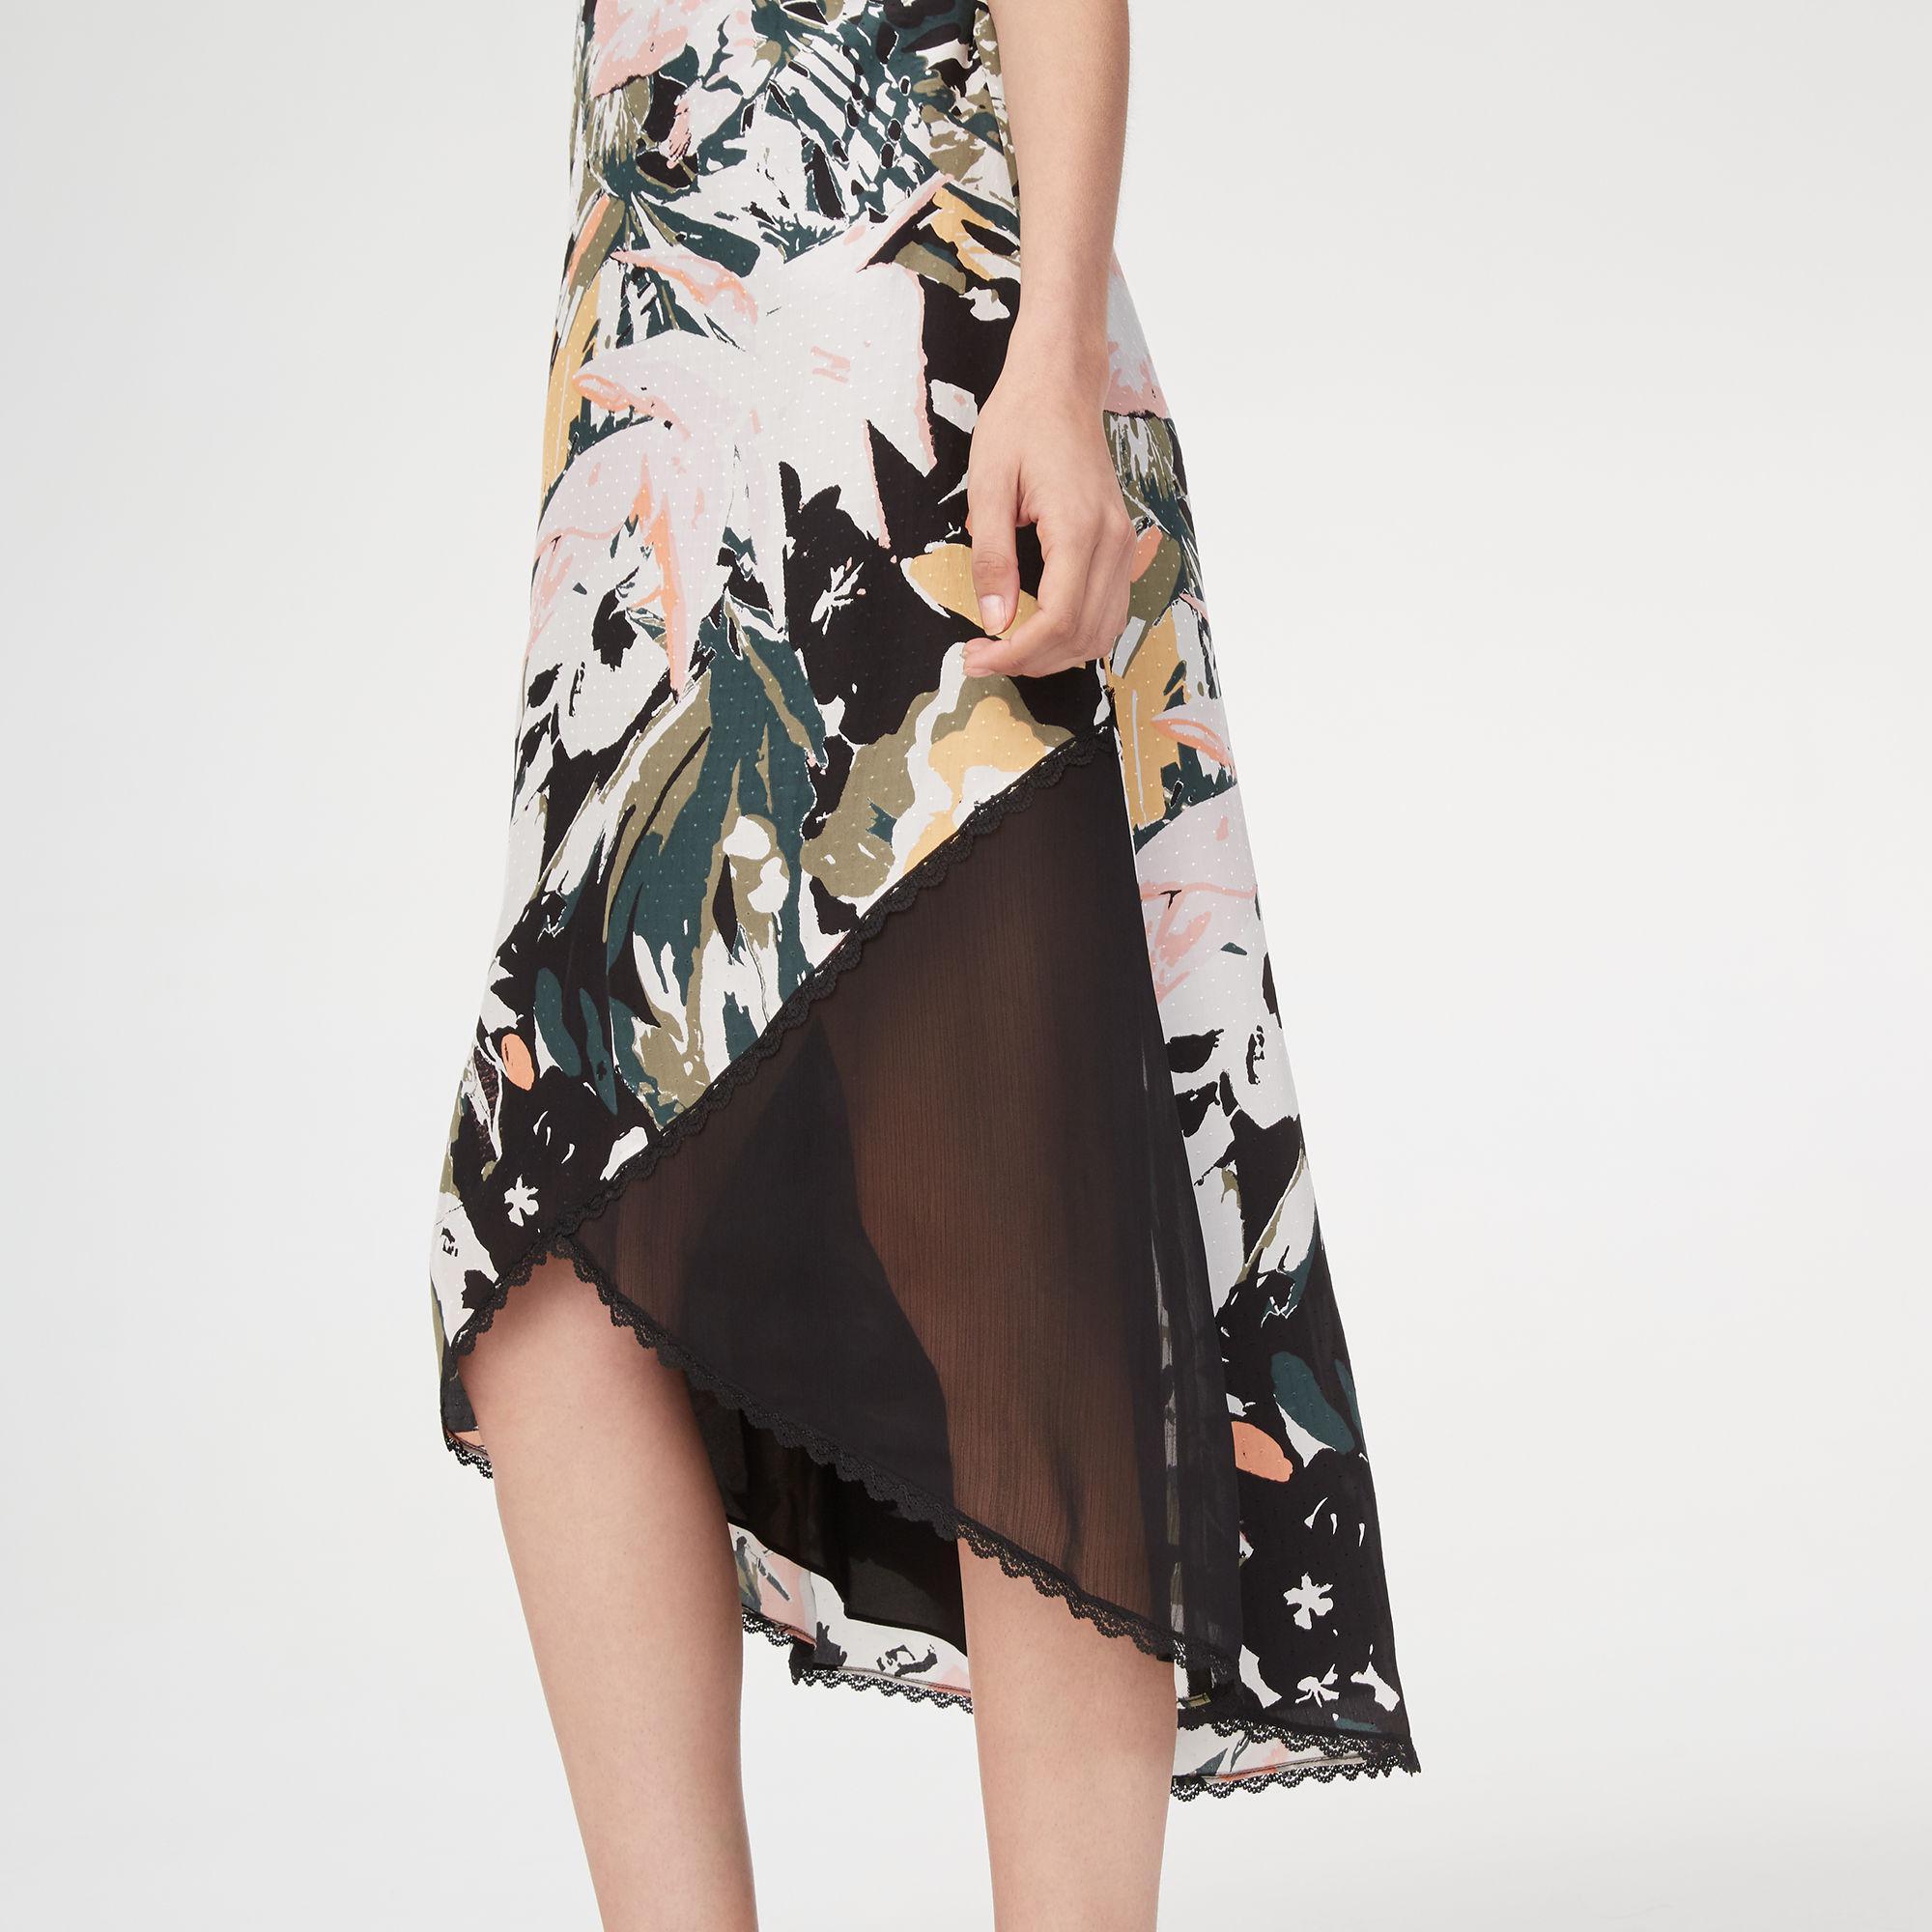 ef346052e448 Club Monaco Kittrick Silk Slip Dress in Black - Lyst